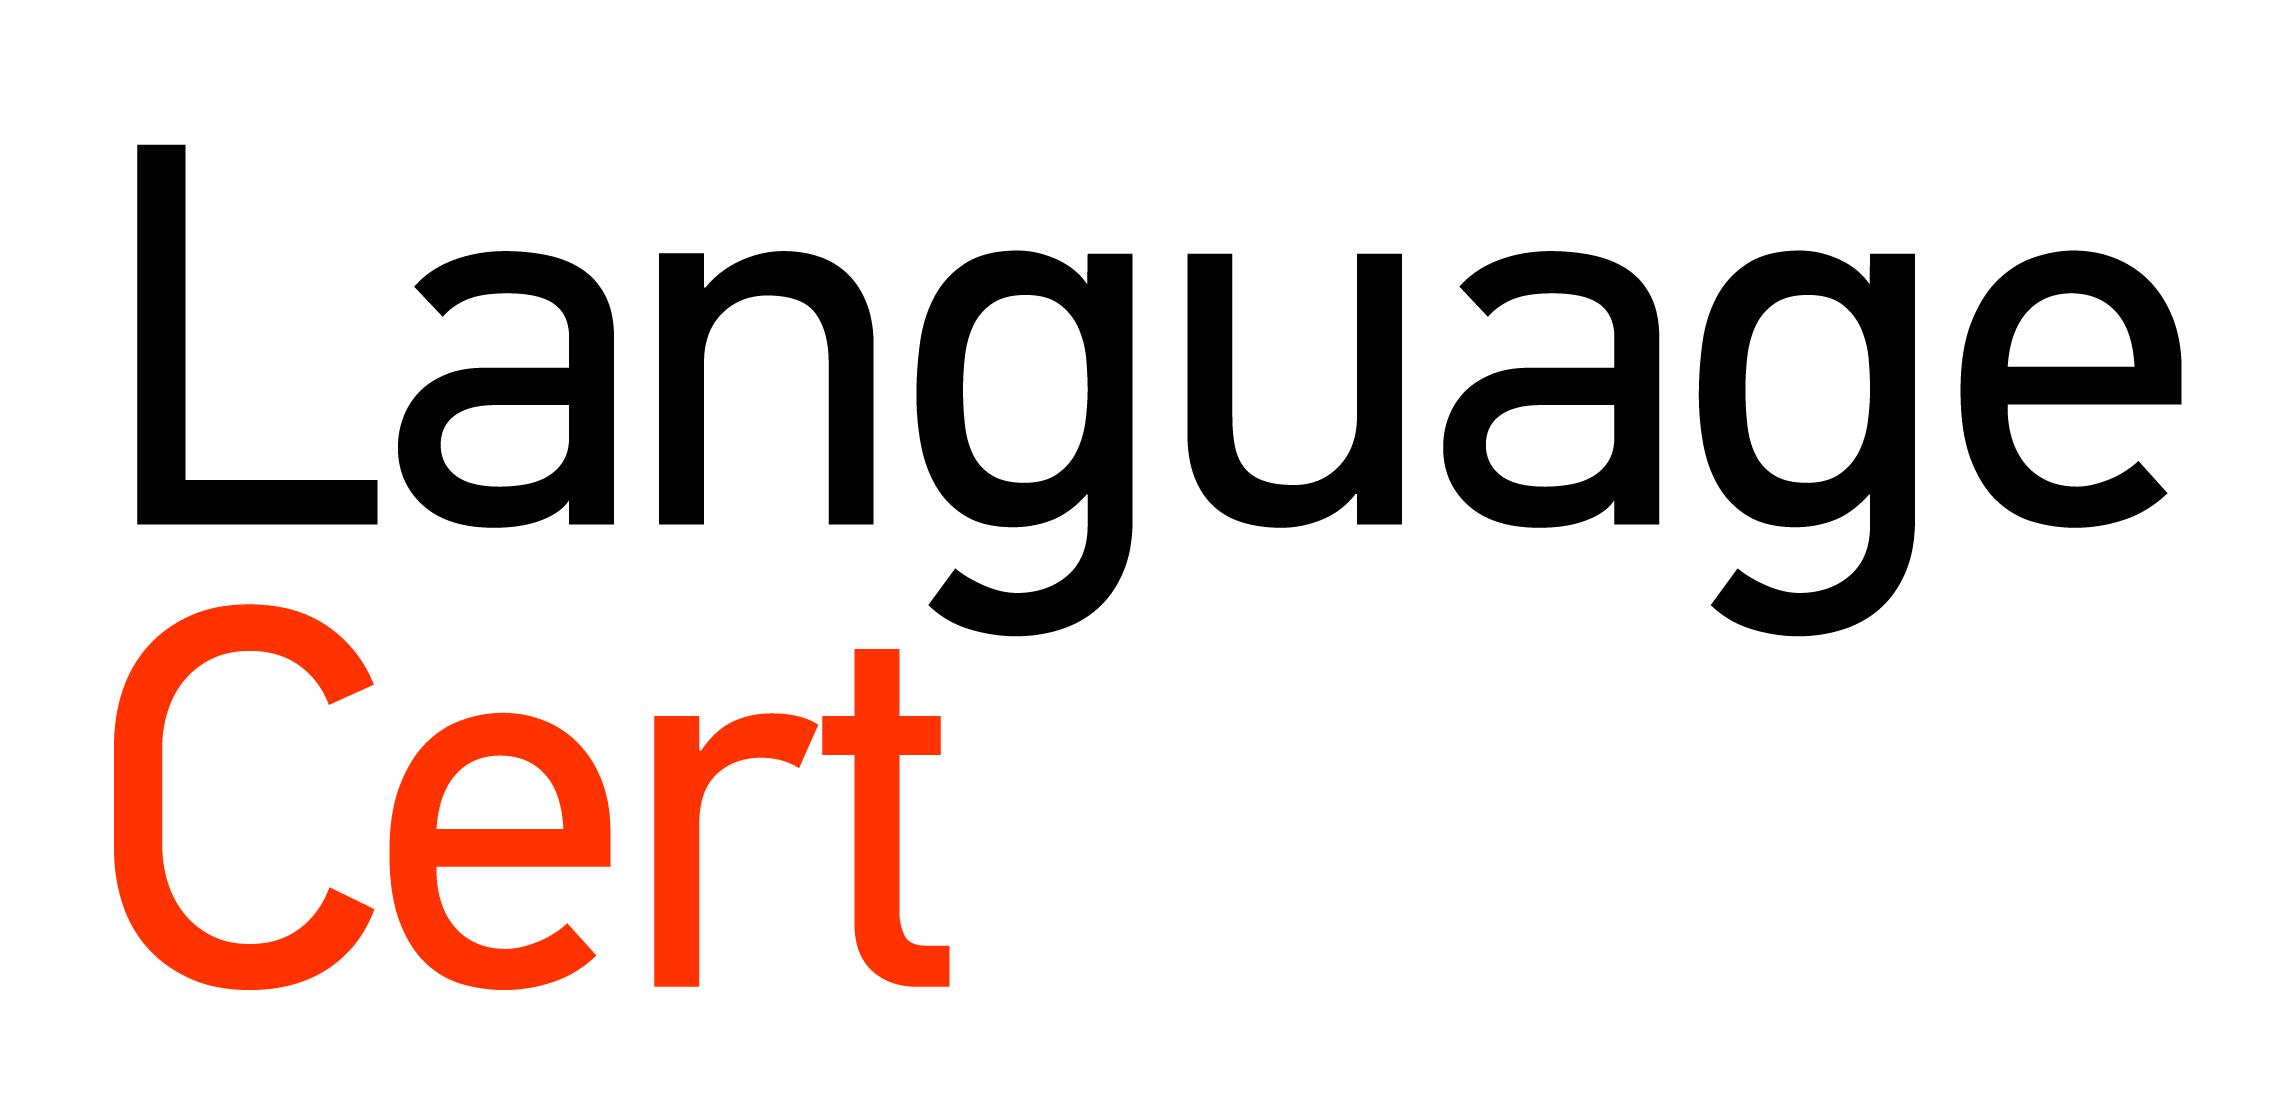 language Cert Certification